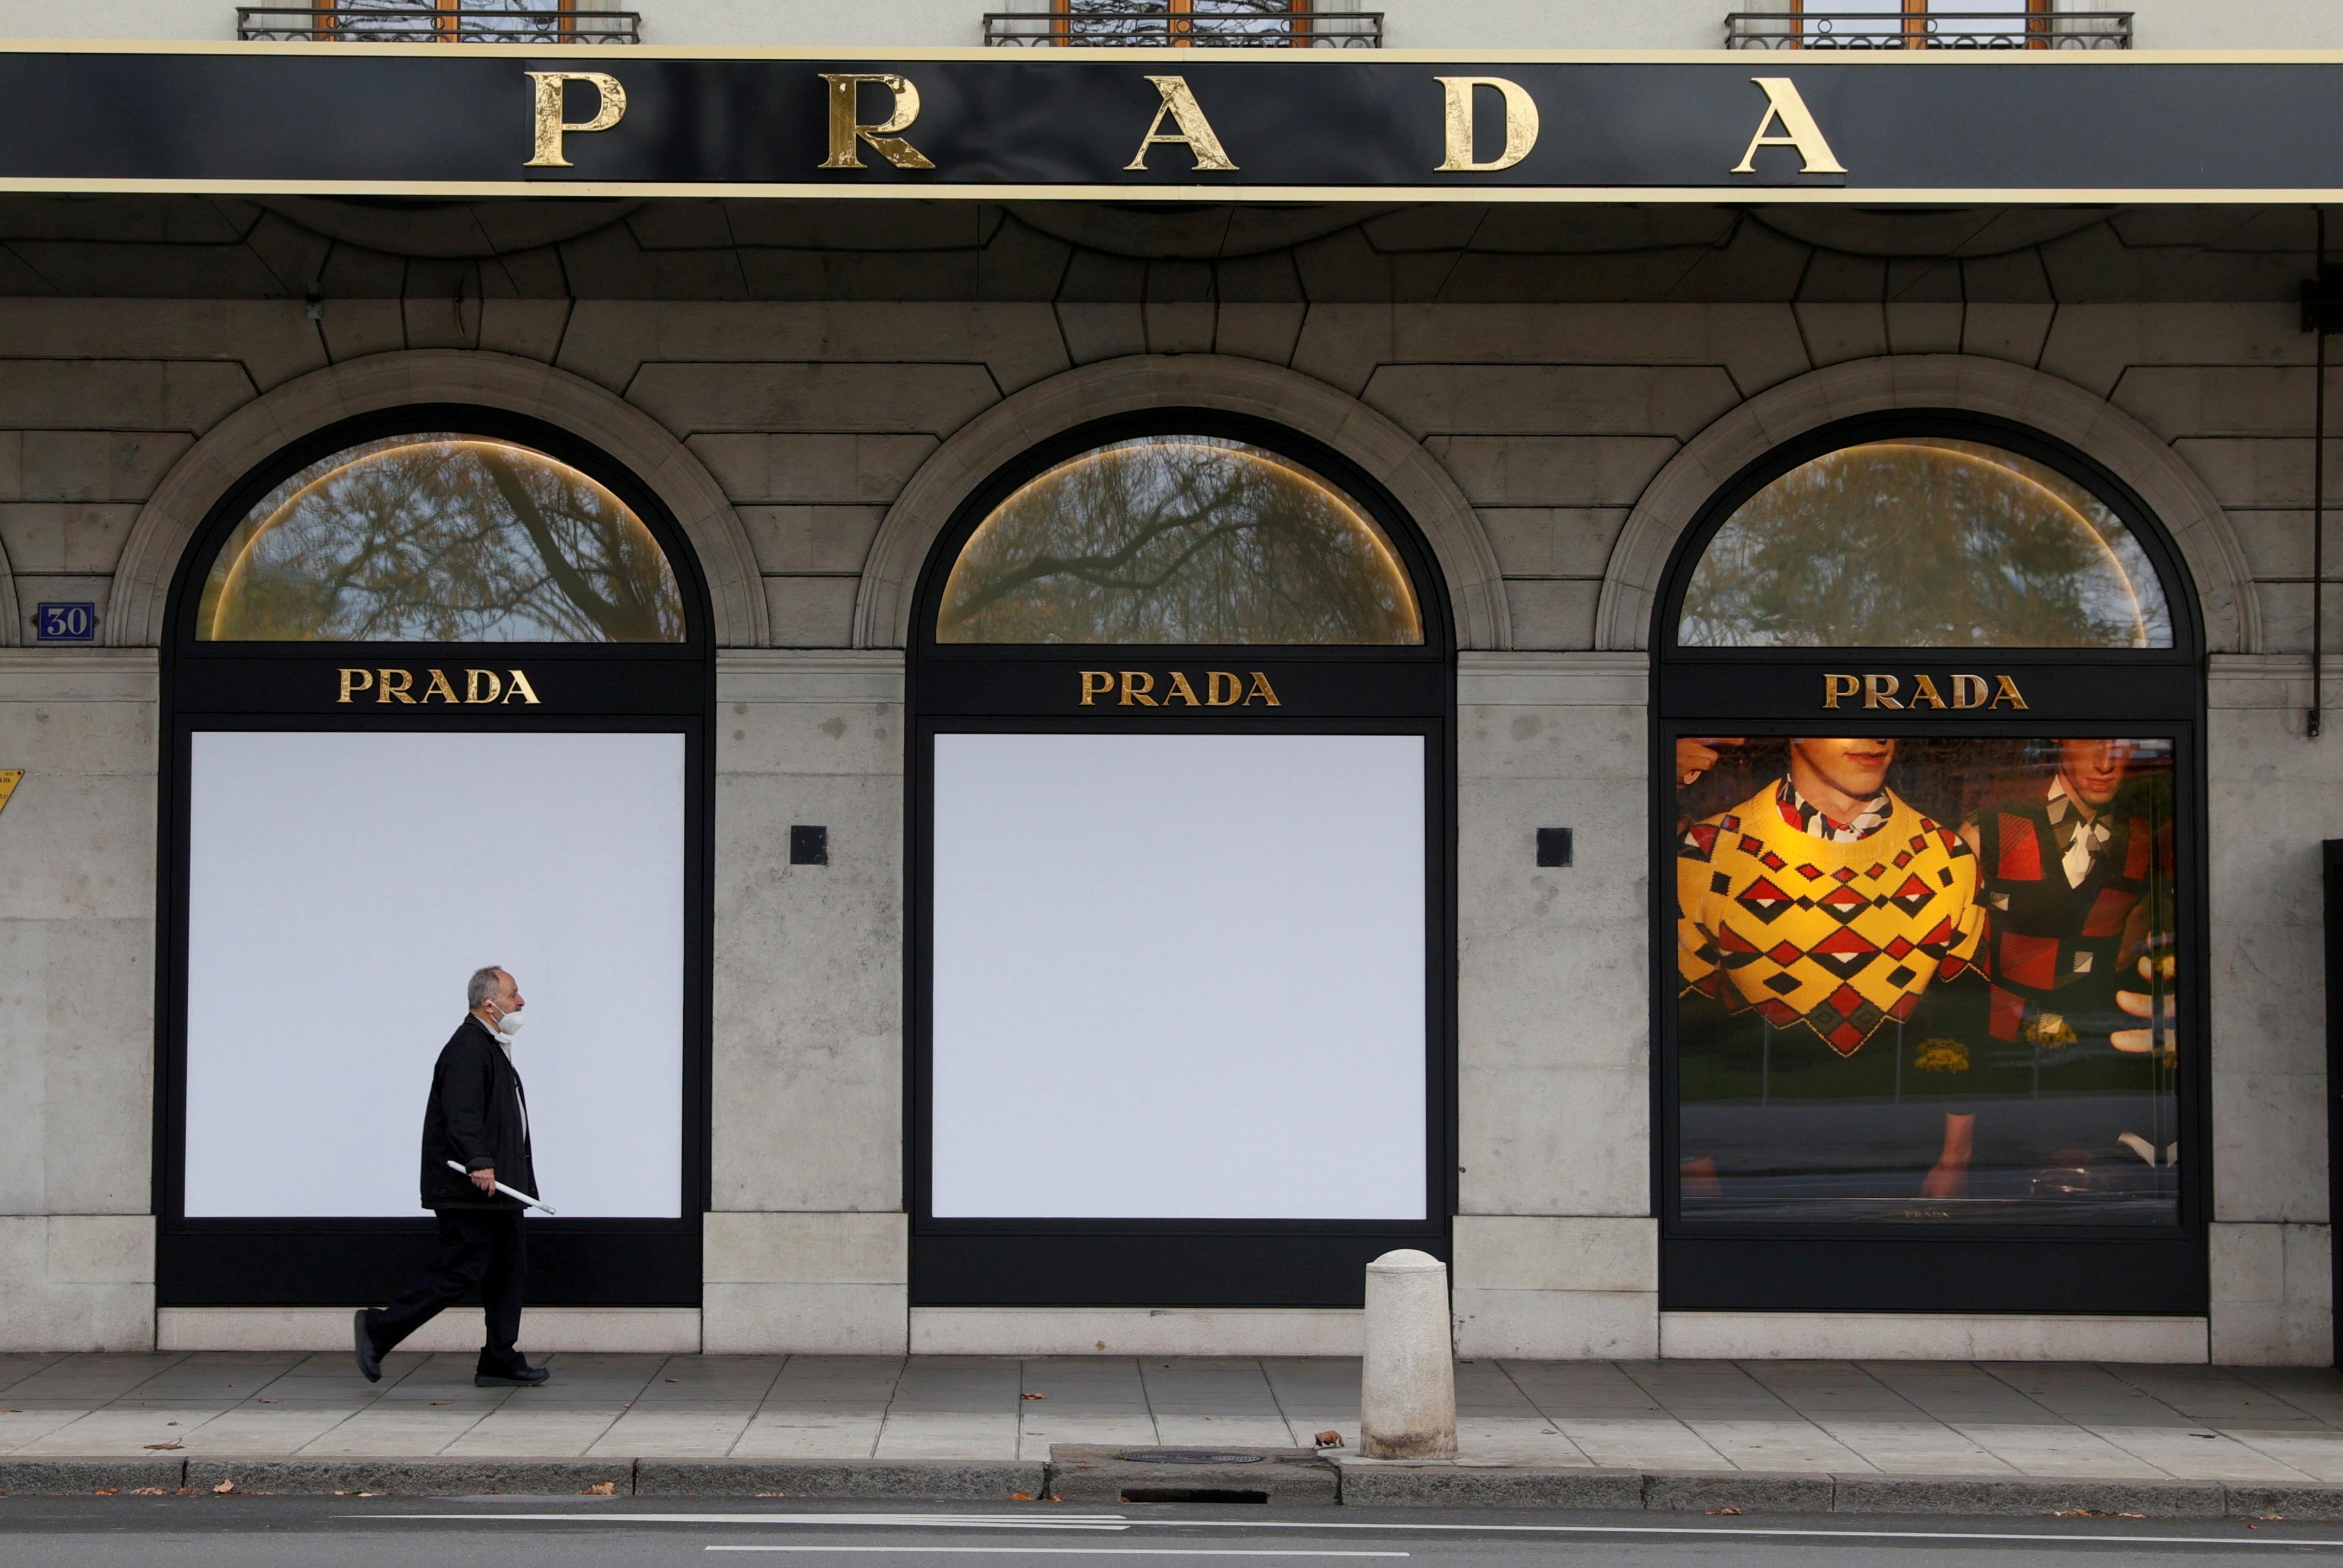 A man walks past a closed Prada shop after partial lockdown measures were introduced amid the coronavirus disease (COVID-19) outbreak in Geneva, Switzerland, November 16, 2020. REUTERS/Denis Balibouse